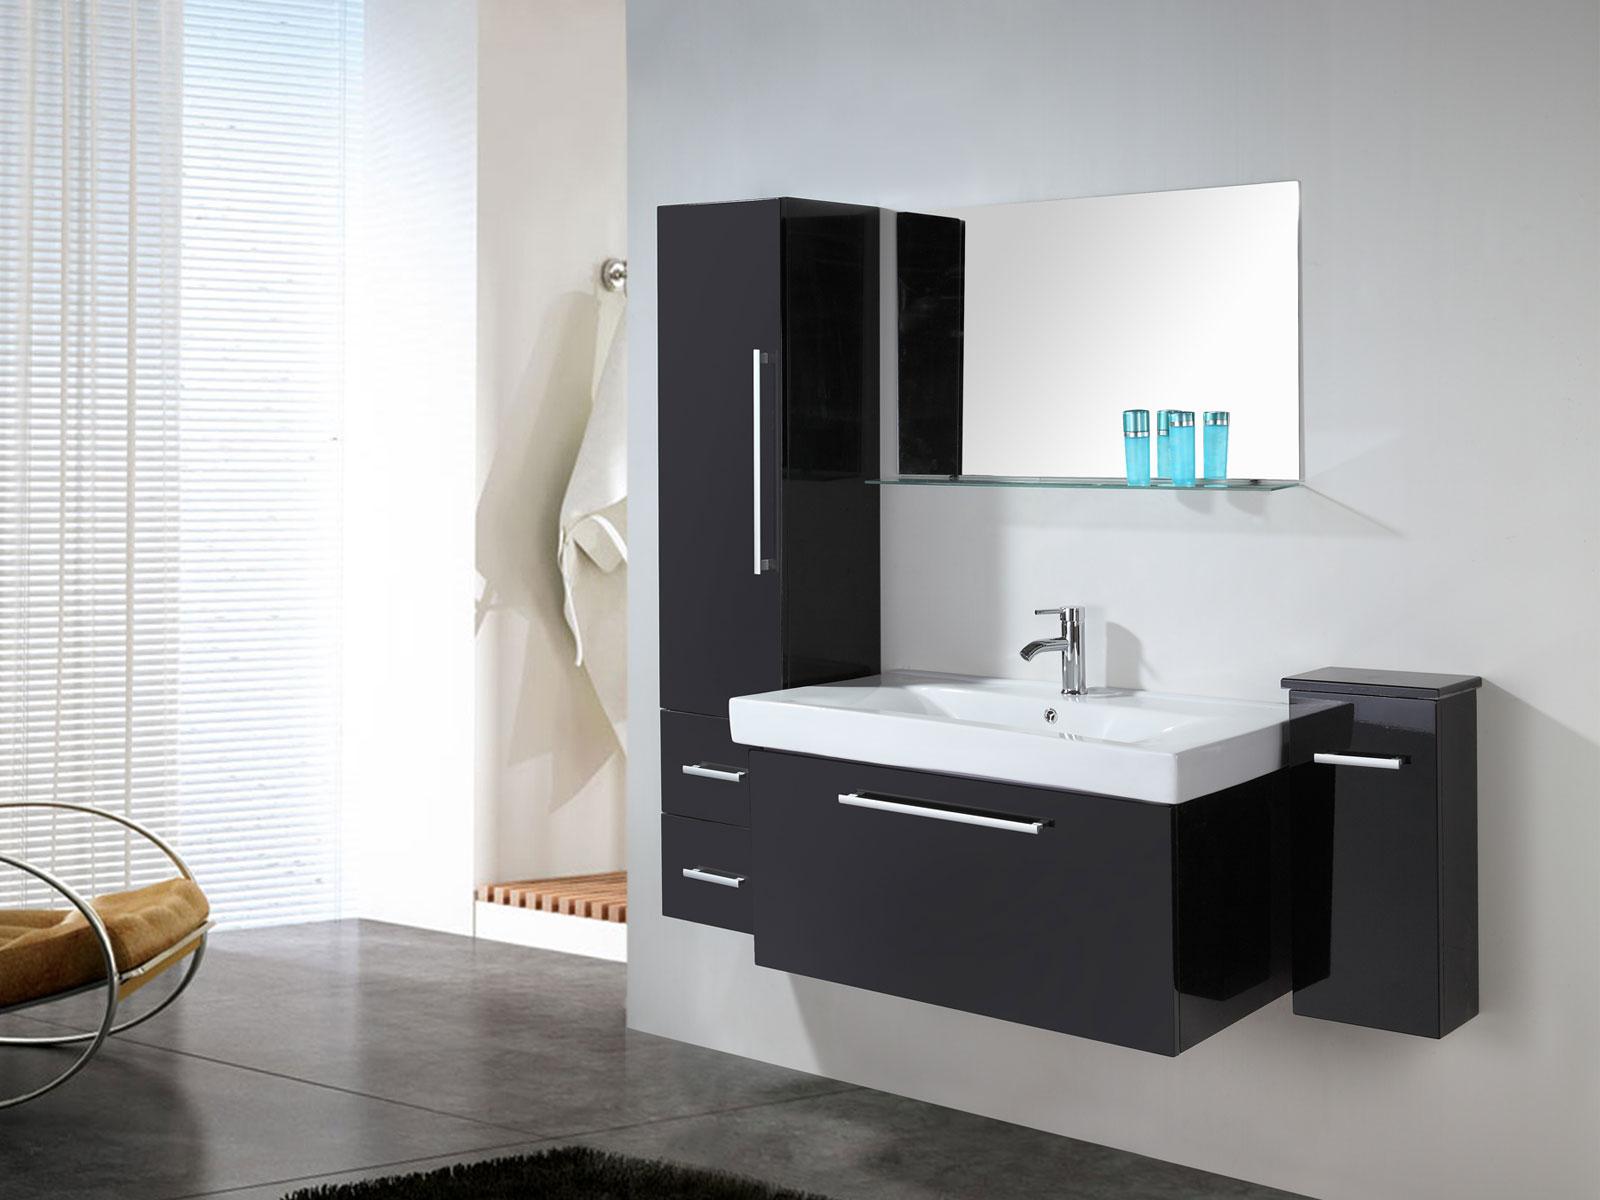 Mobile arredo bagno arredobagno london 100 cm rubinetteria for Mobili bagno 35 cm